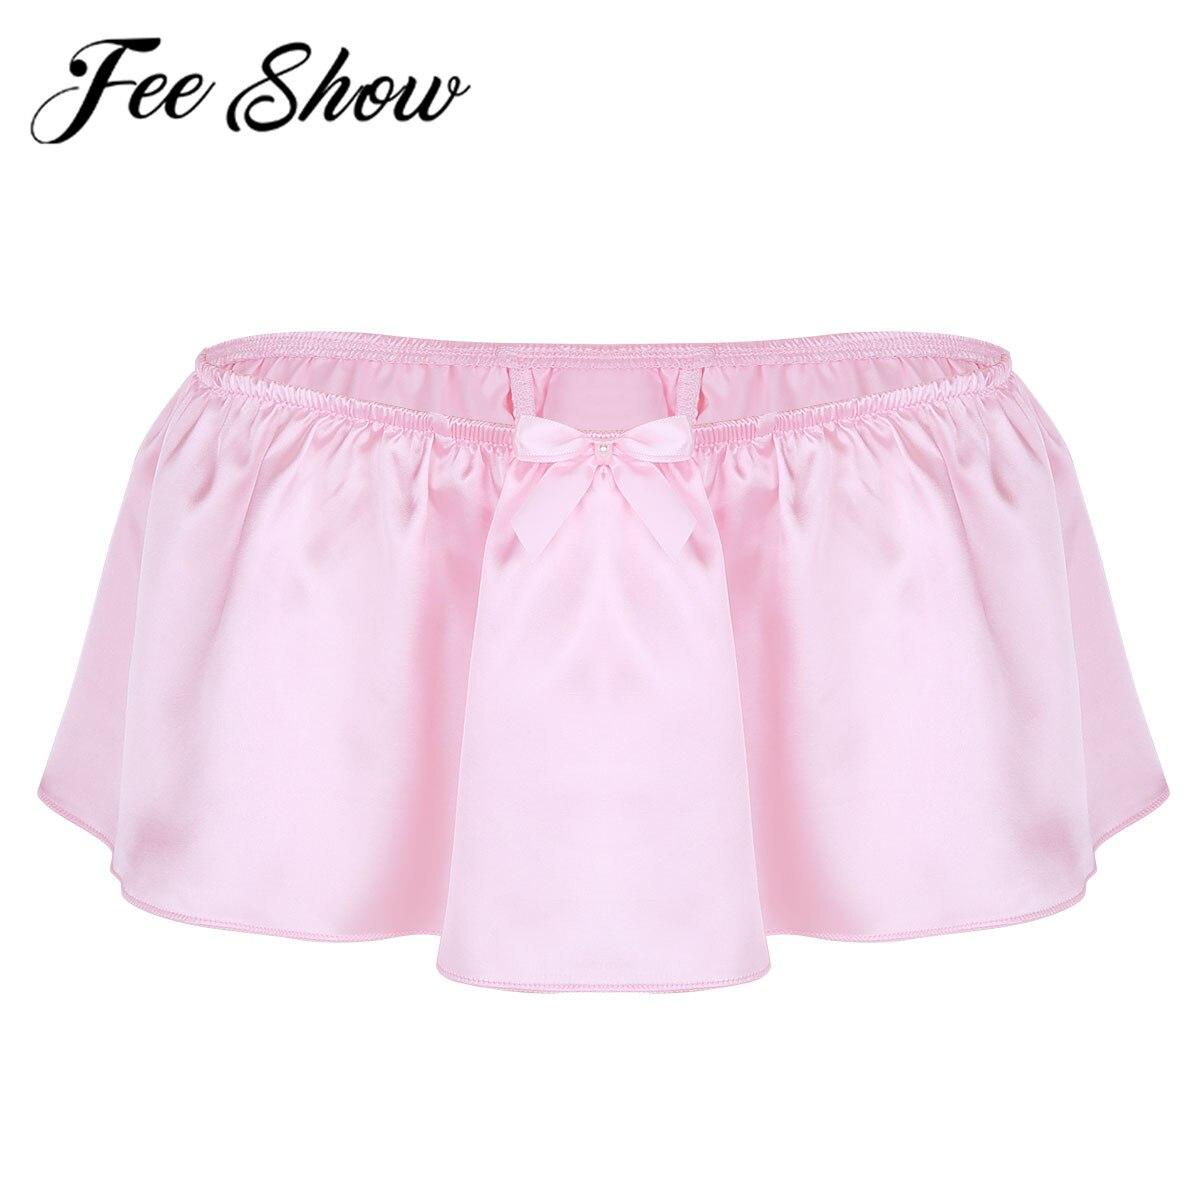 Sexy Men Lingerie Shiny Satin Sissy Skirted G-string Thong Bikini Nightwear Underwear Underpants Exotic Panties Party Clubwear